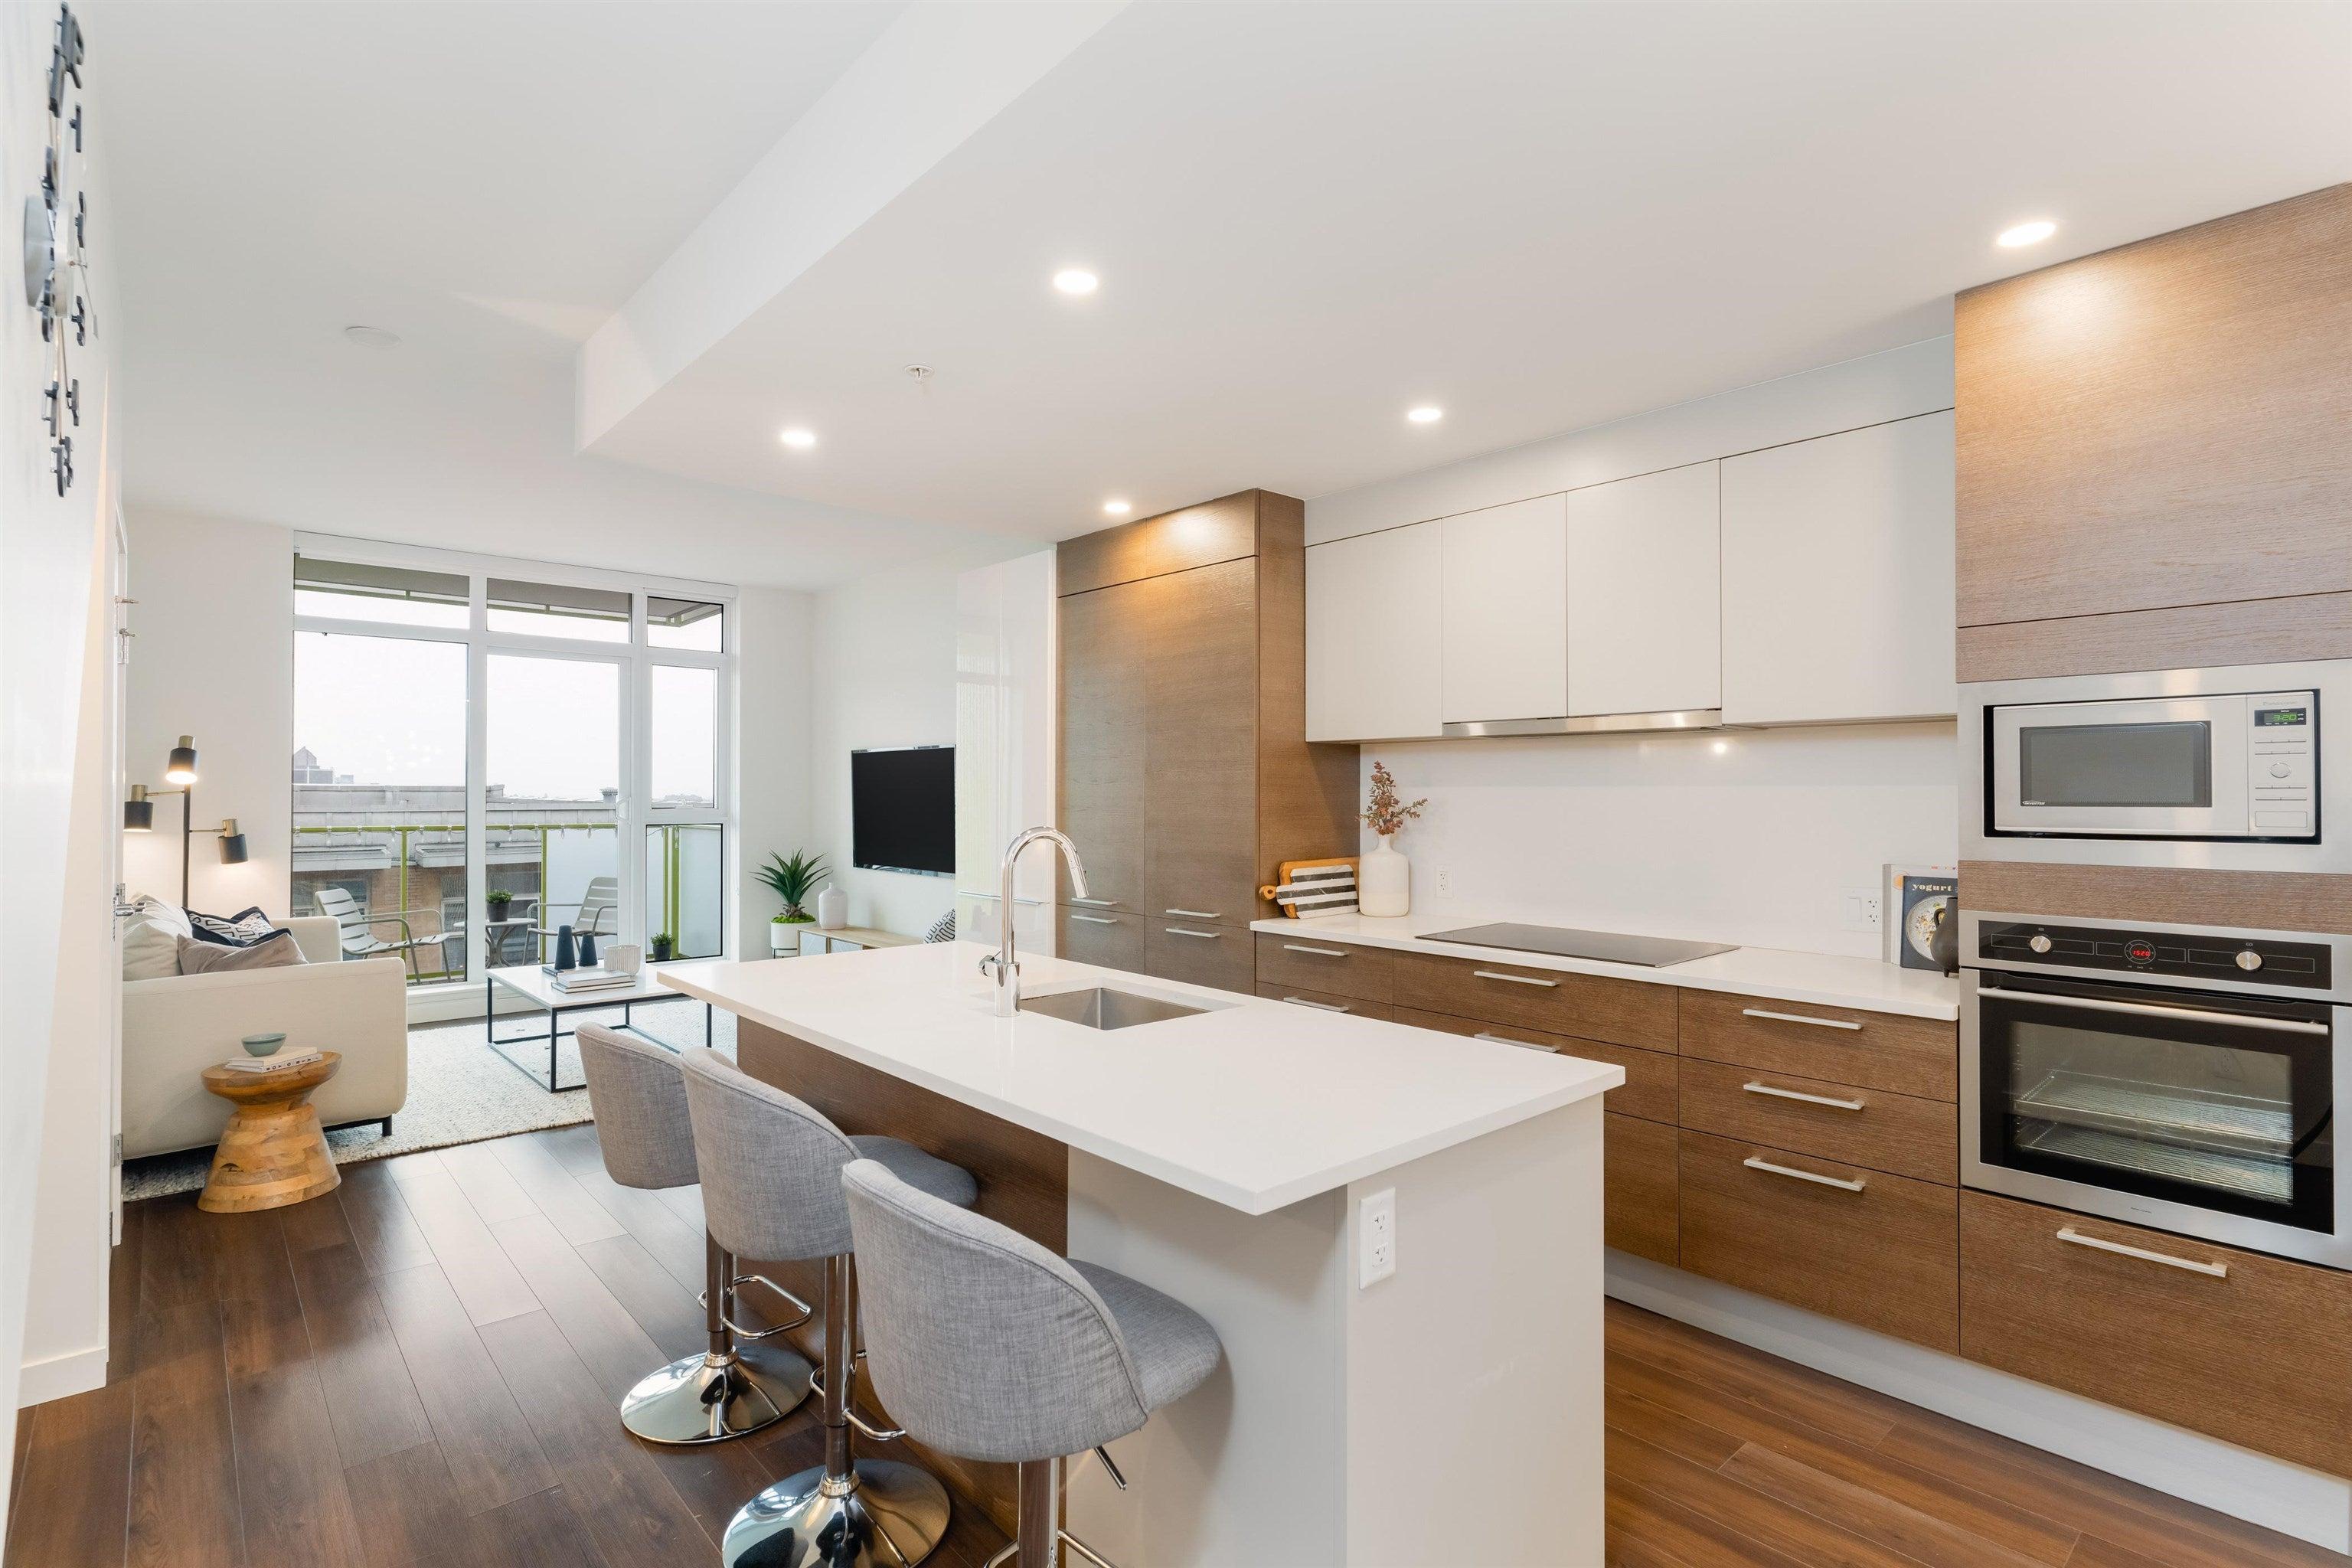 523 2508 WATSON STREET - Mount Pleasant VE Townhouse for sale, 3 Bedrooms (R2625701) - #9